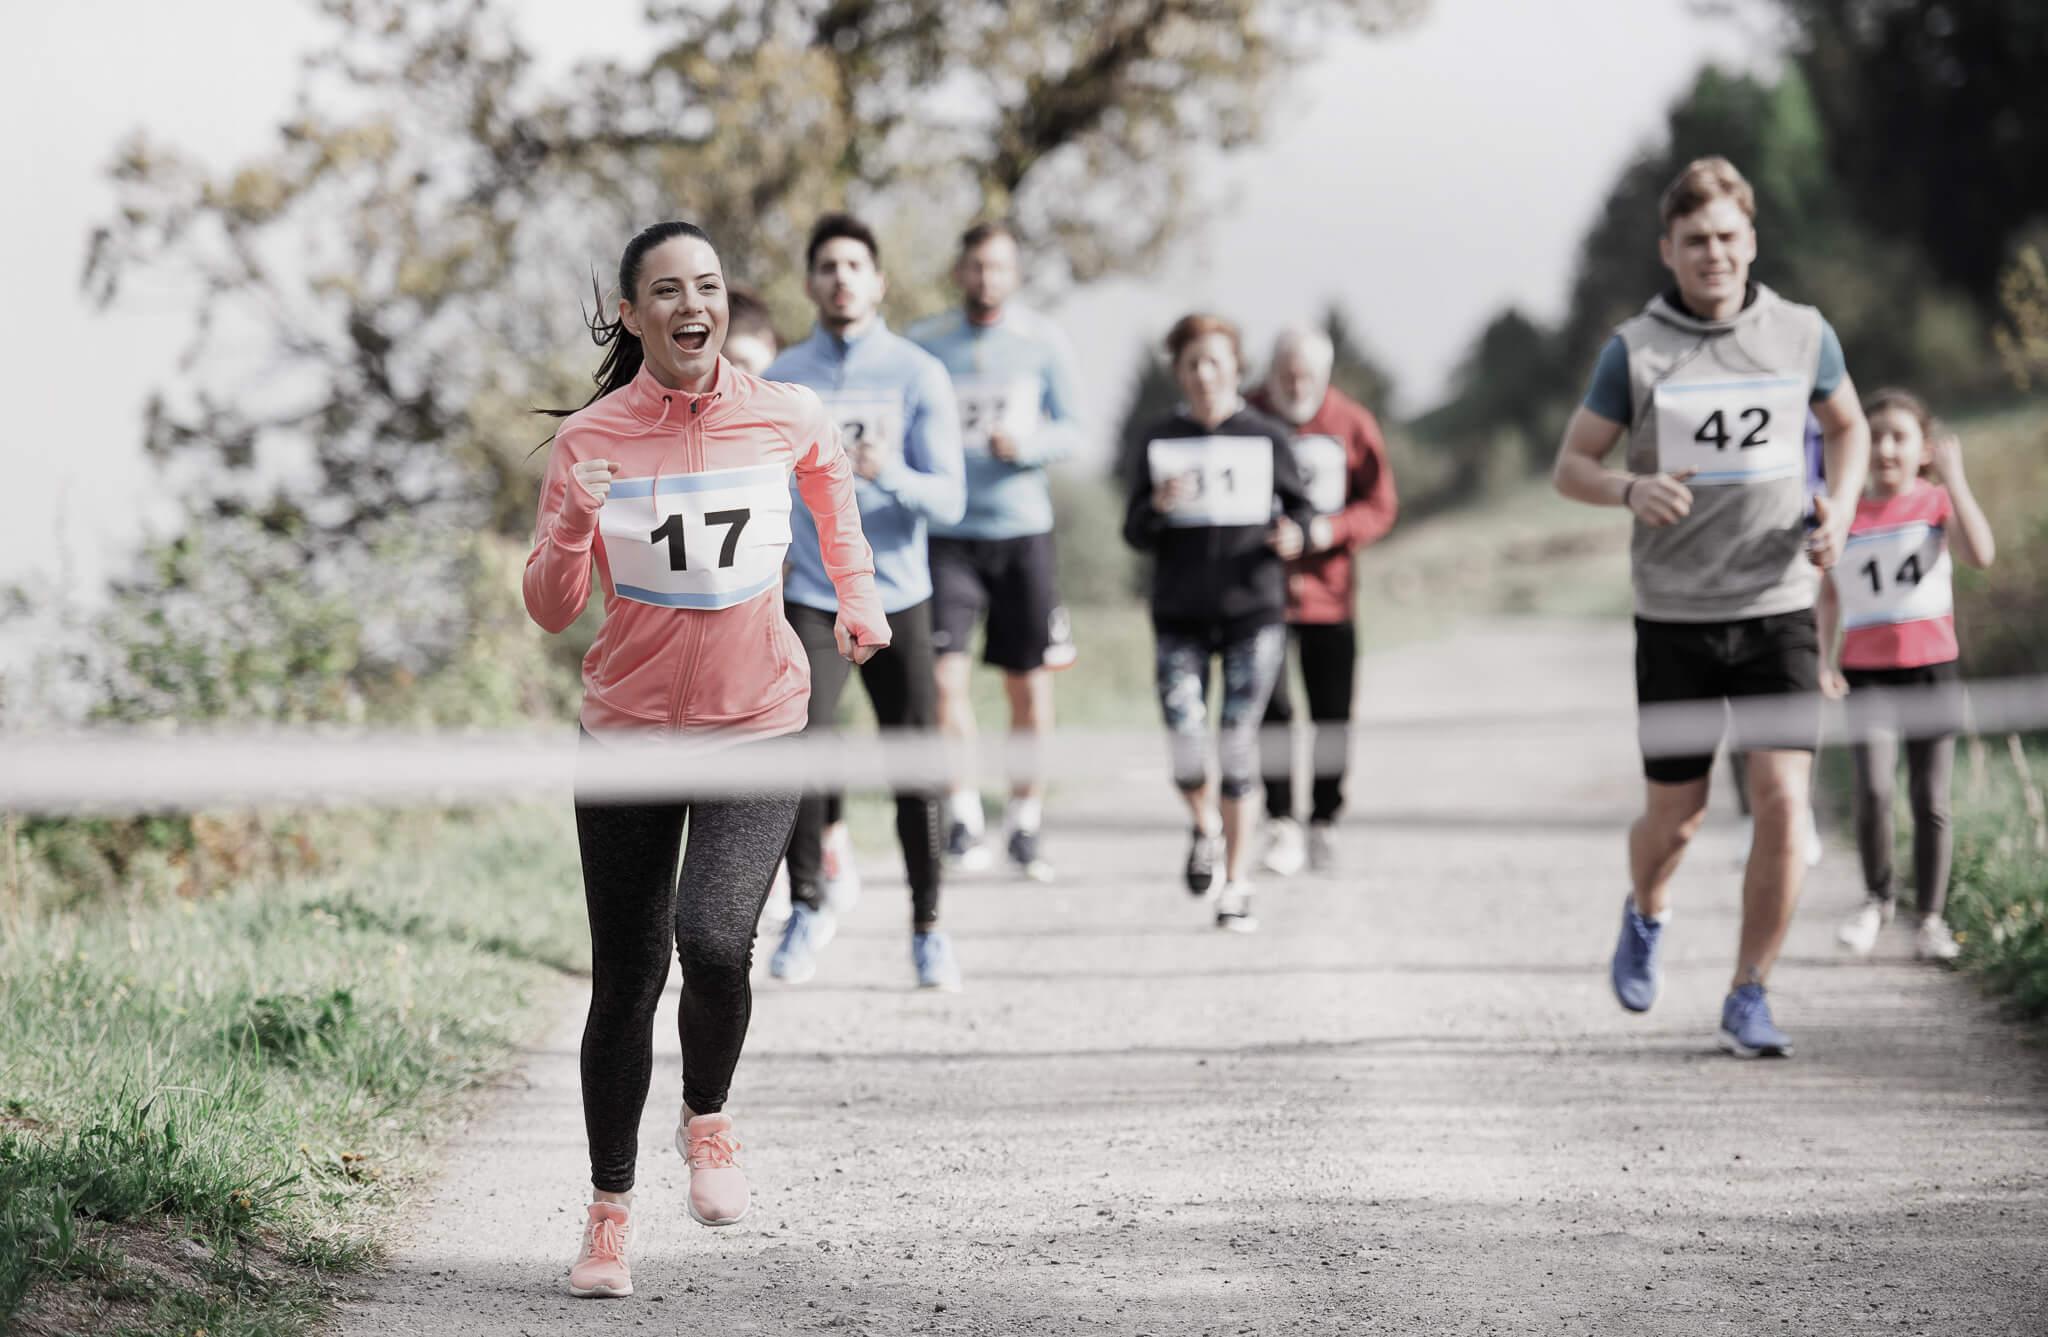 People running a marathon to raise money to help homeless poeple